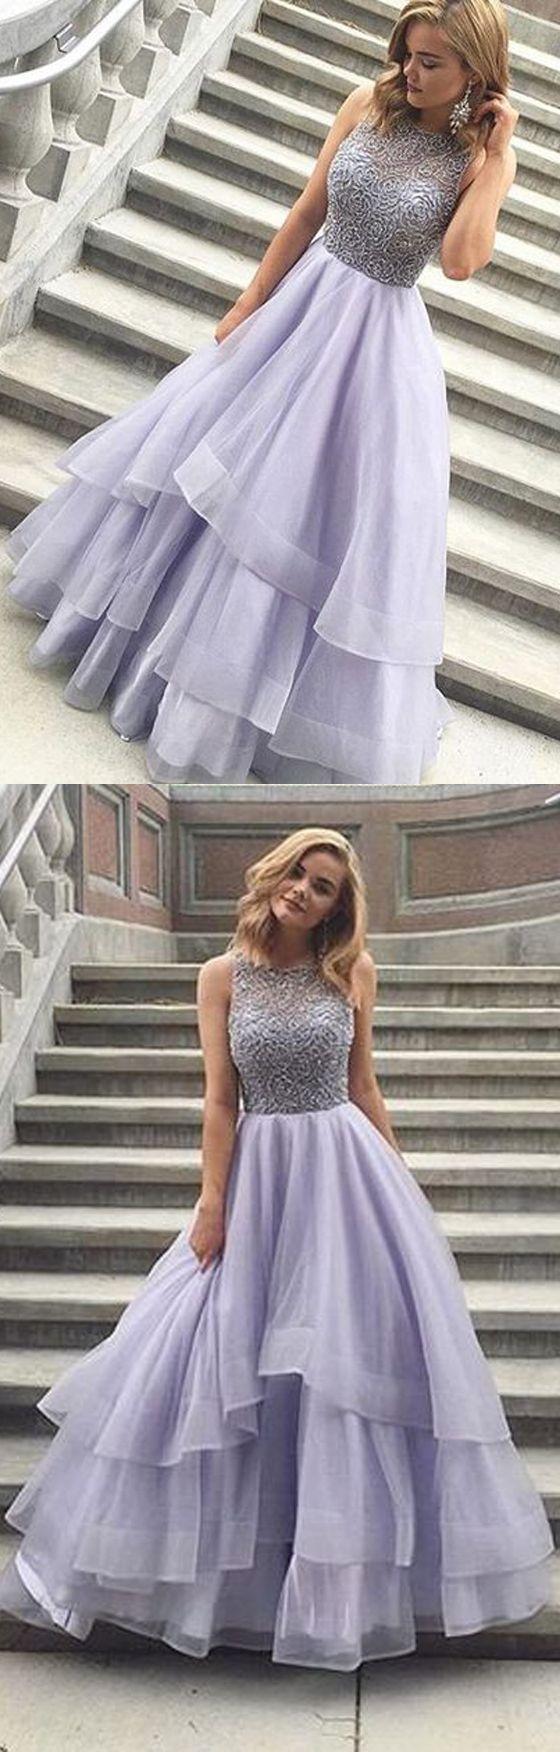 Lavender prom dress charming prom dress inexpensive prom dress